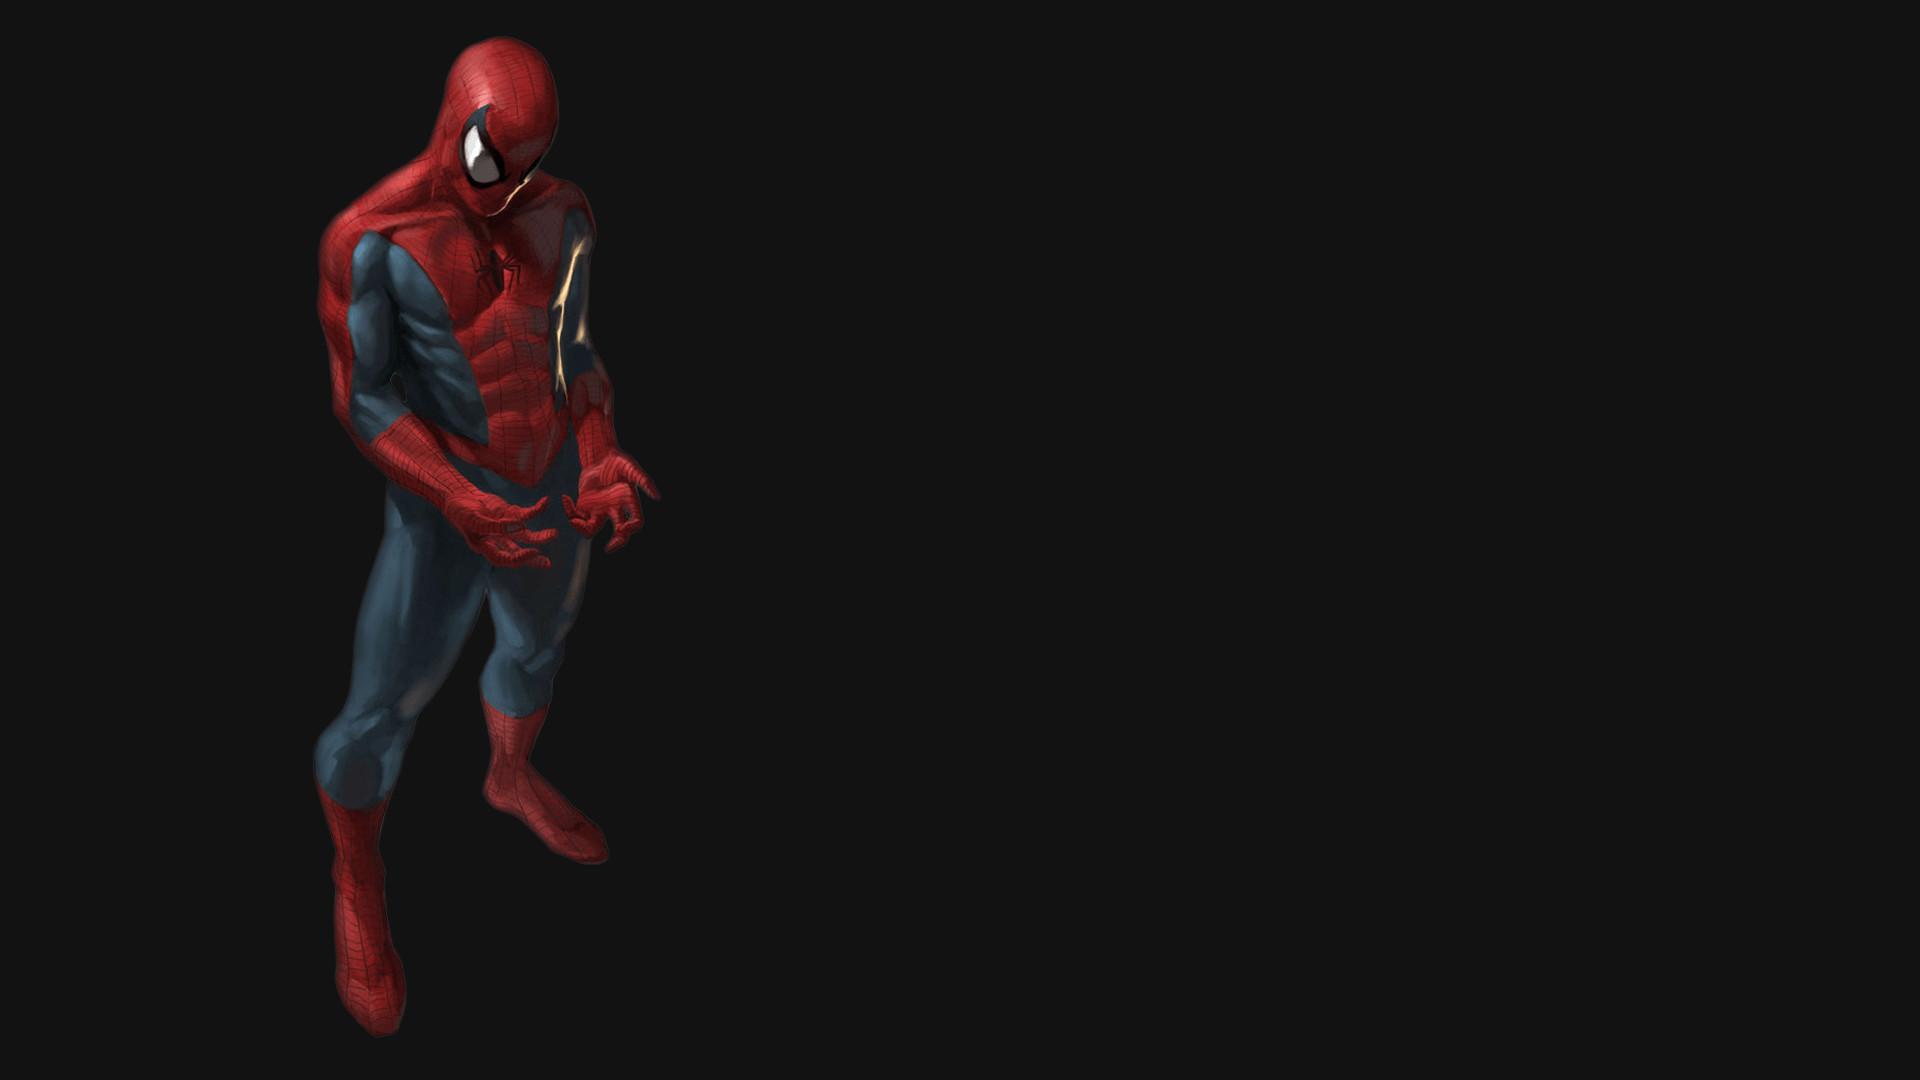 Black Spiderman Wallpaper Iphone Wallpaper   HDMarvelWallpaper